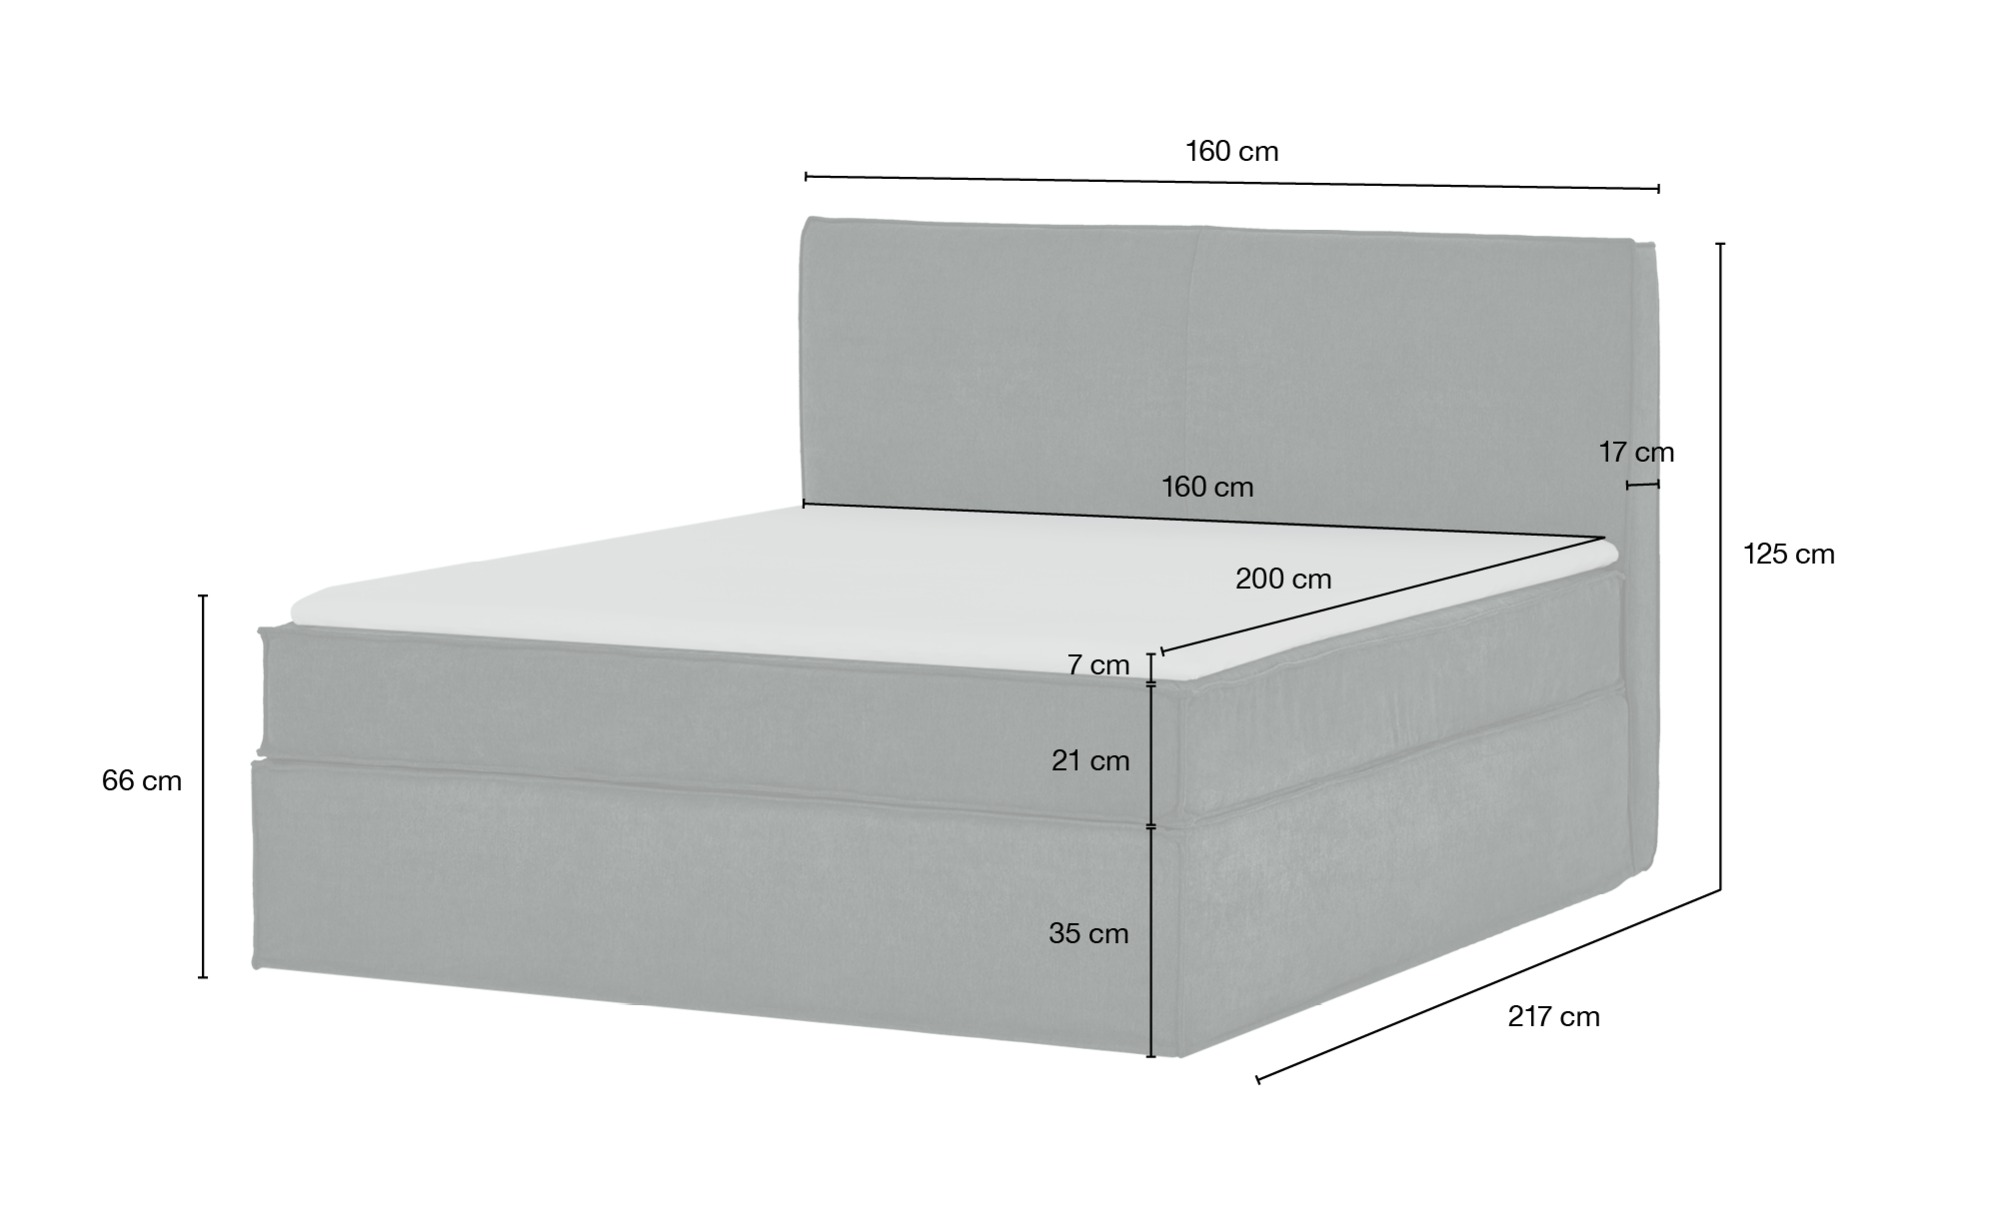 Boxspringbett 160 x 200 cm  Boxi ¦ grün ¦ Maße (cm): B: 160 H: 125 Betten > Boxspringbetten > Boxspringbetten 160x200 - Höffner